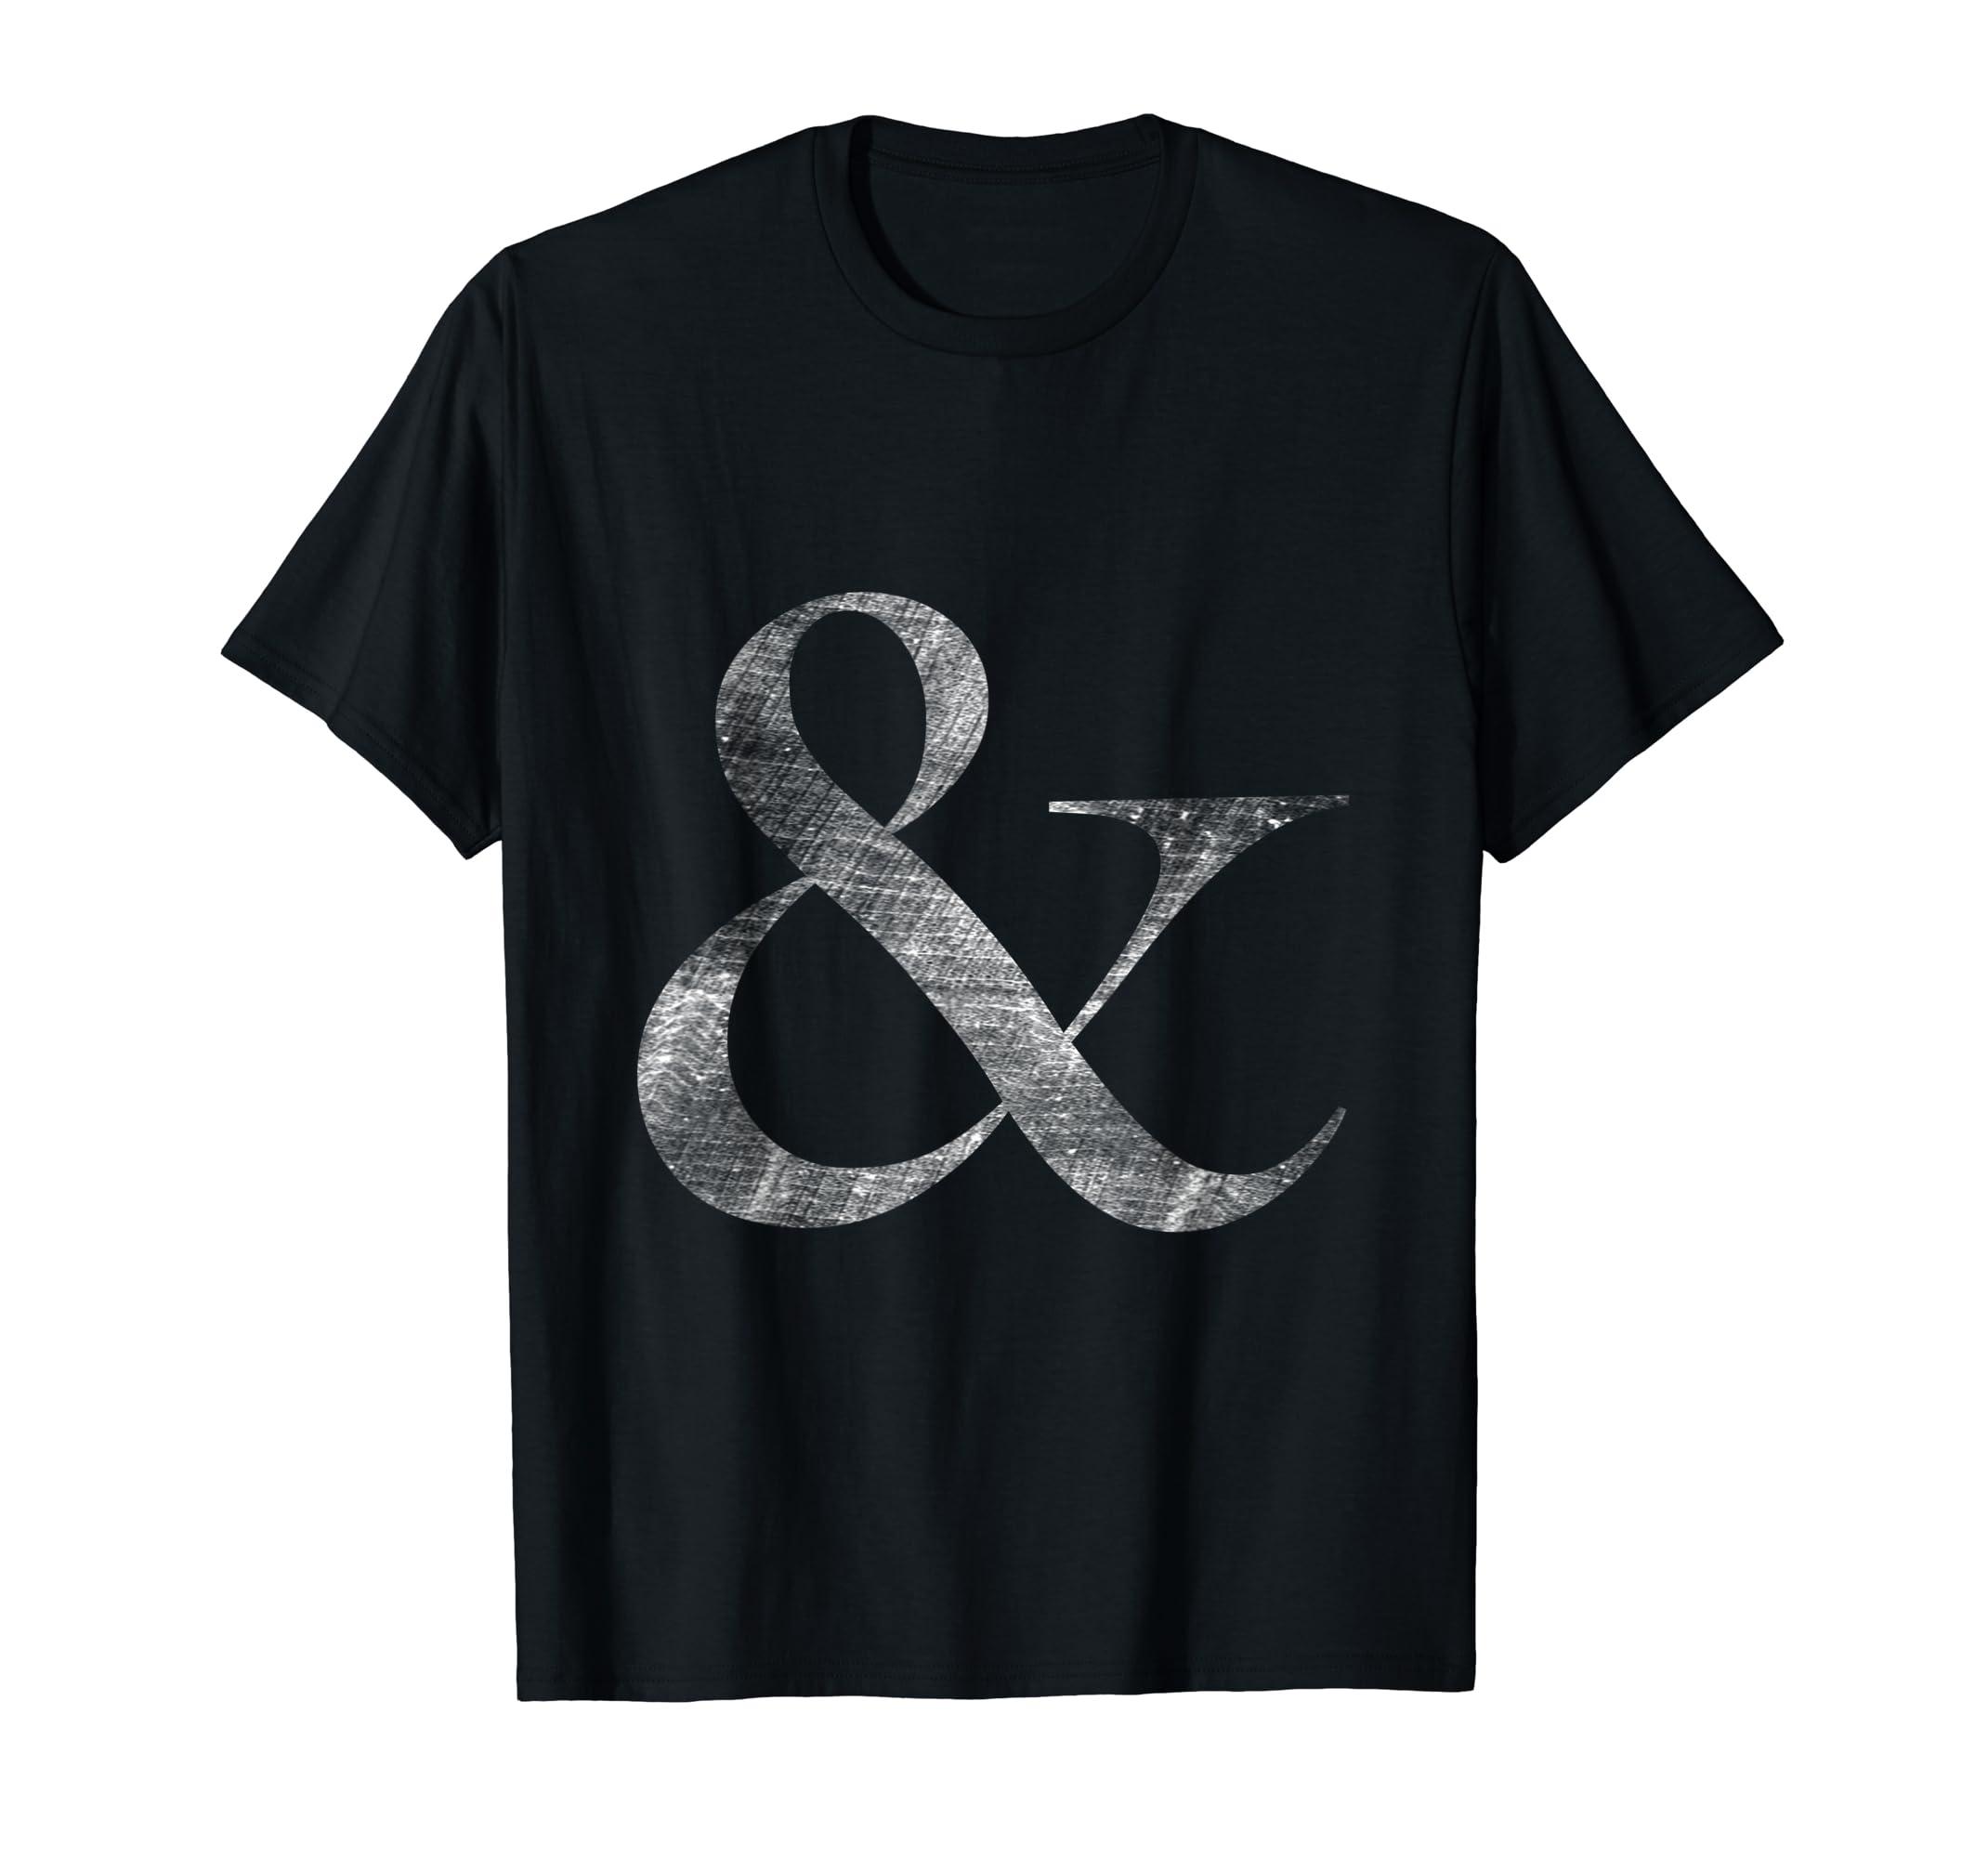 f990dfc6d1c Amazon.com  Big Caslon Medium Letterpress Style Ampersand t-shirt  Clothing